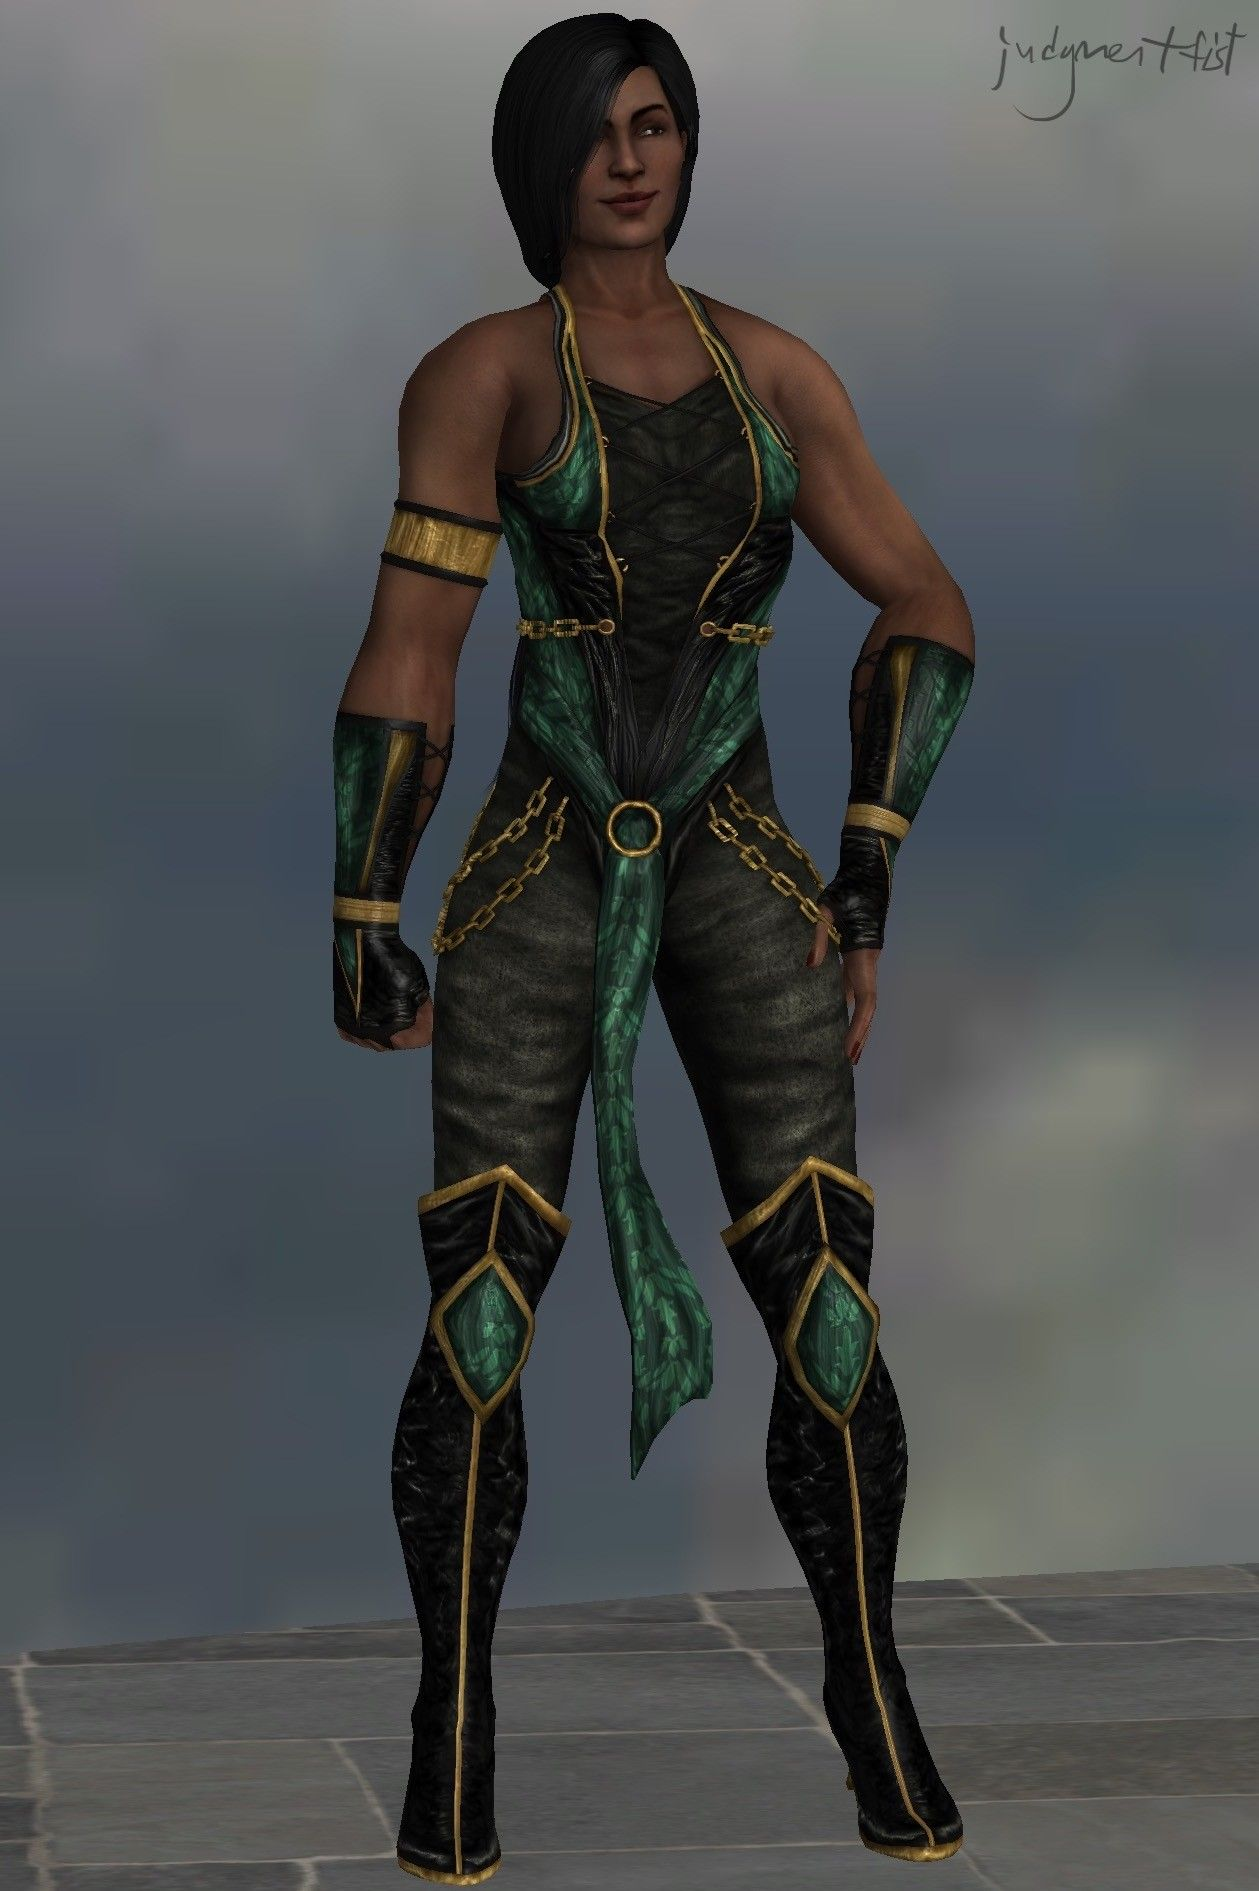 ArtStation - Revised Jade (MK9), JF (EE) | Ps4 | Mortal